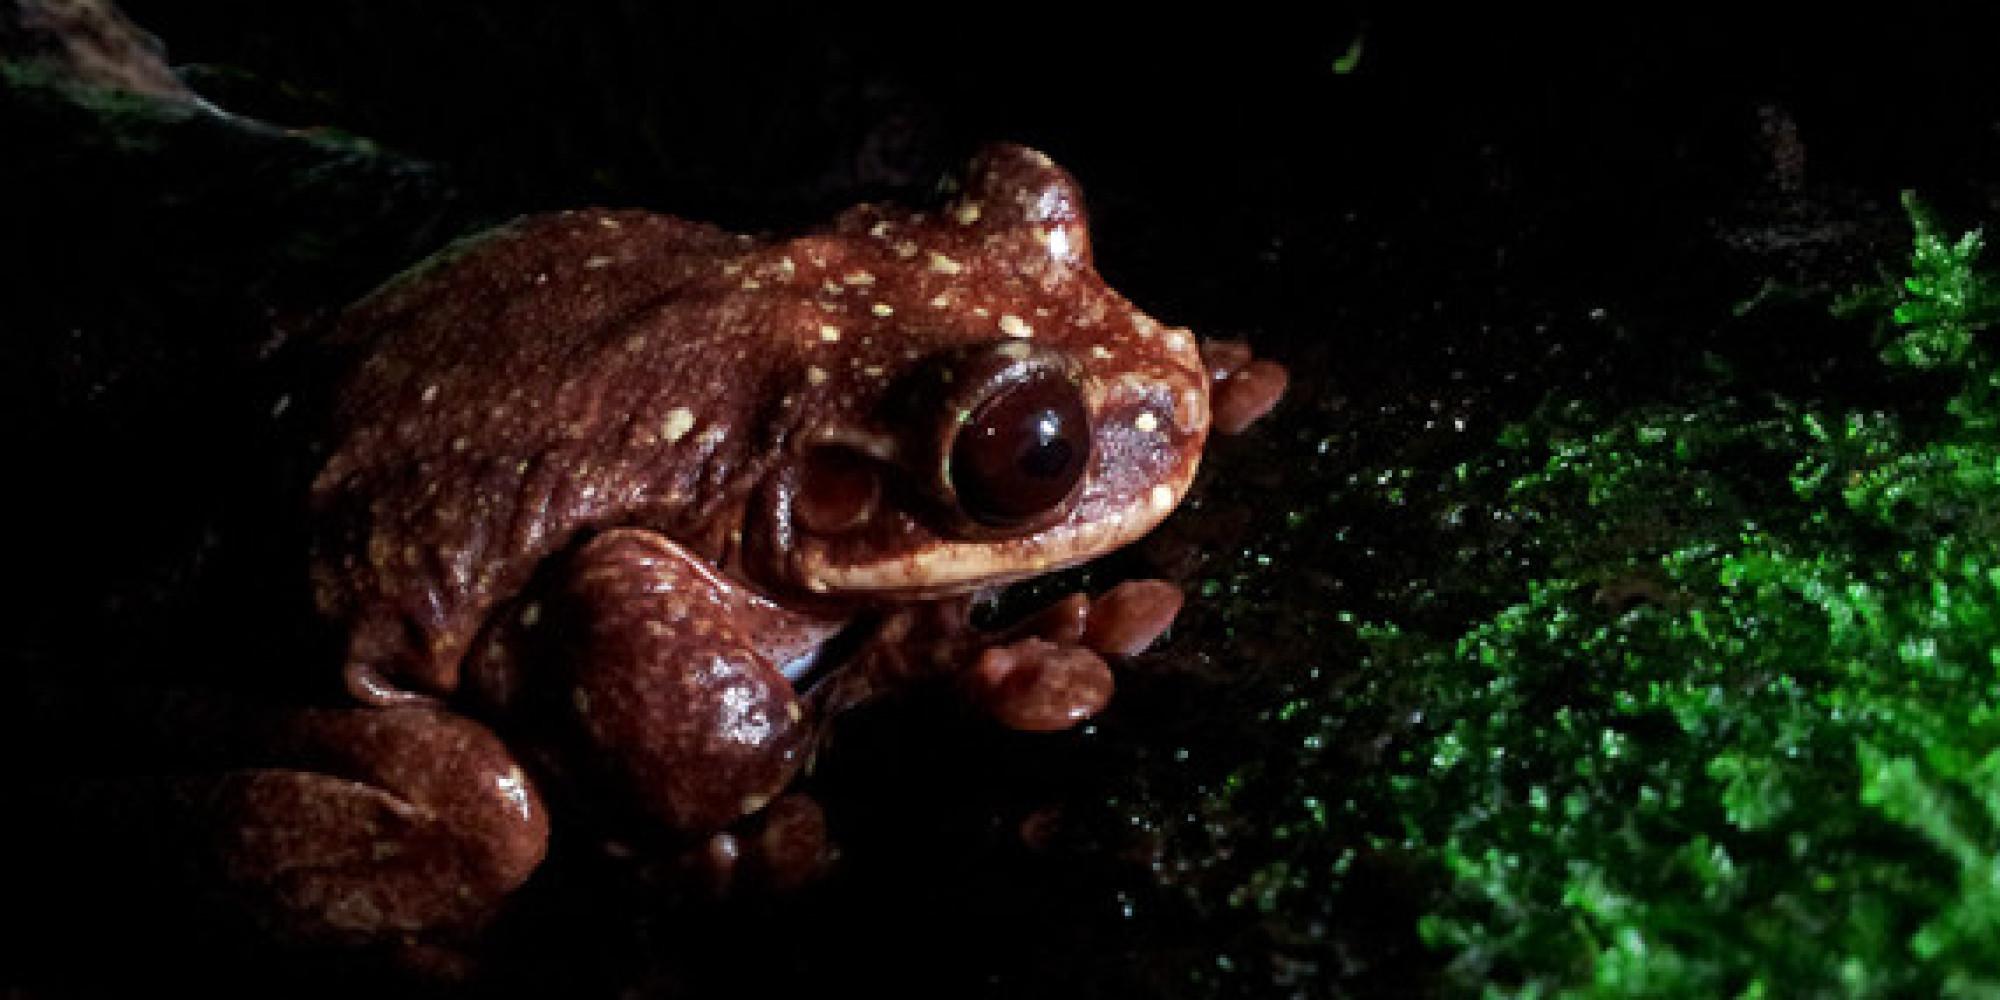 o-tree-frog-facebook